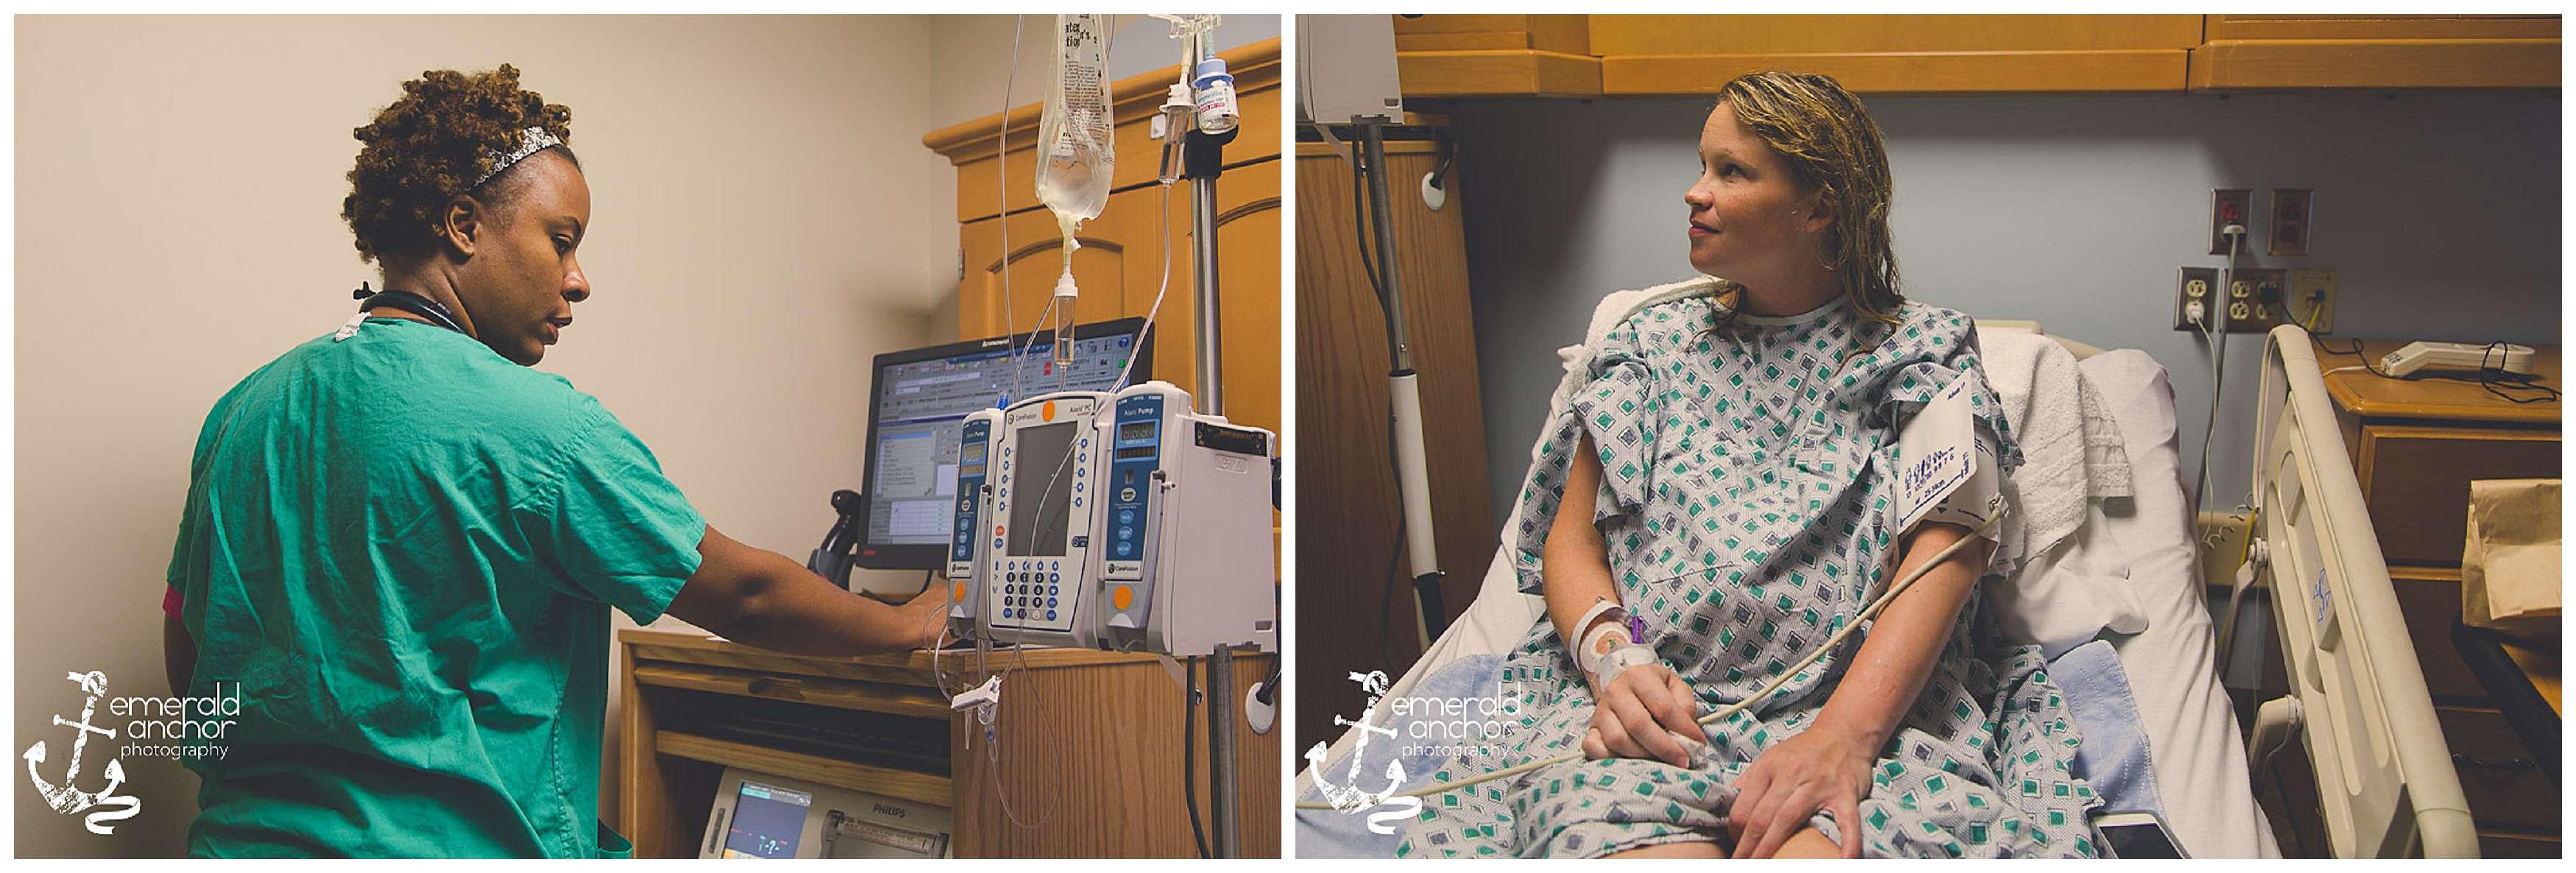 Emerald Anchor Photography Riverside Hospital Birth Story Photography Uriah Kade (2)